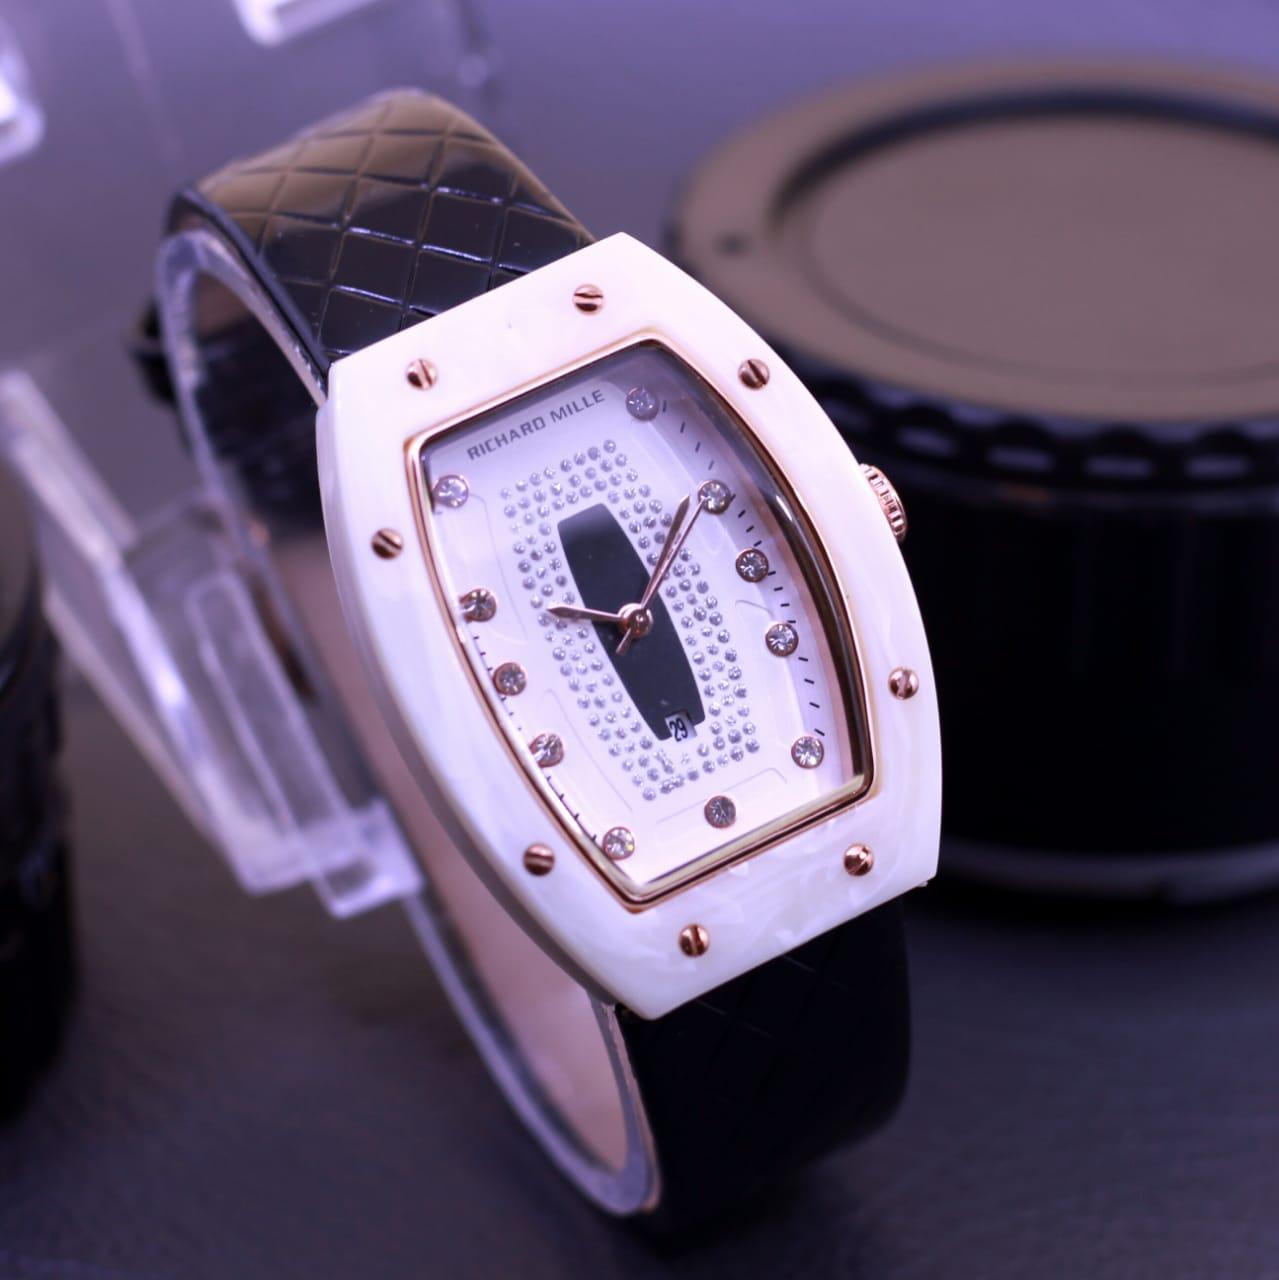 Jam tangan Richard Mille KW Talu kulit jam tangan wanita lengkap dengan box